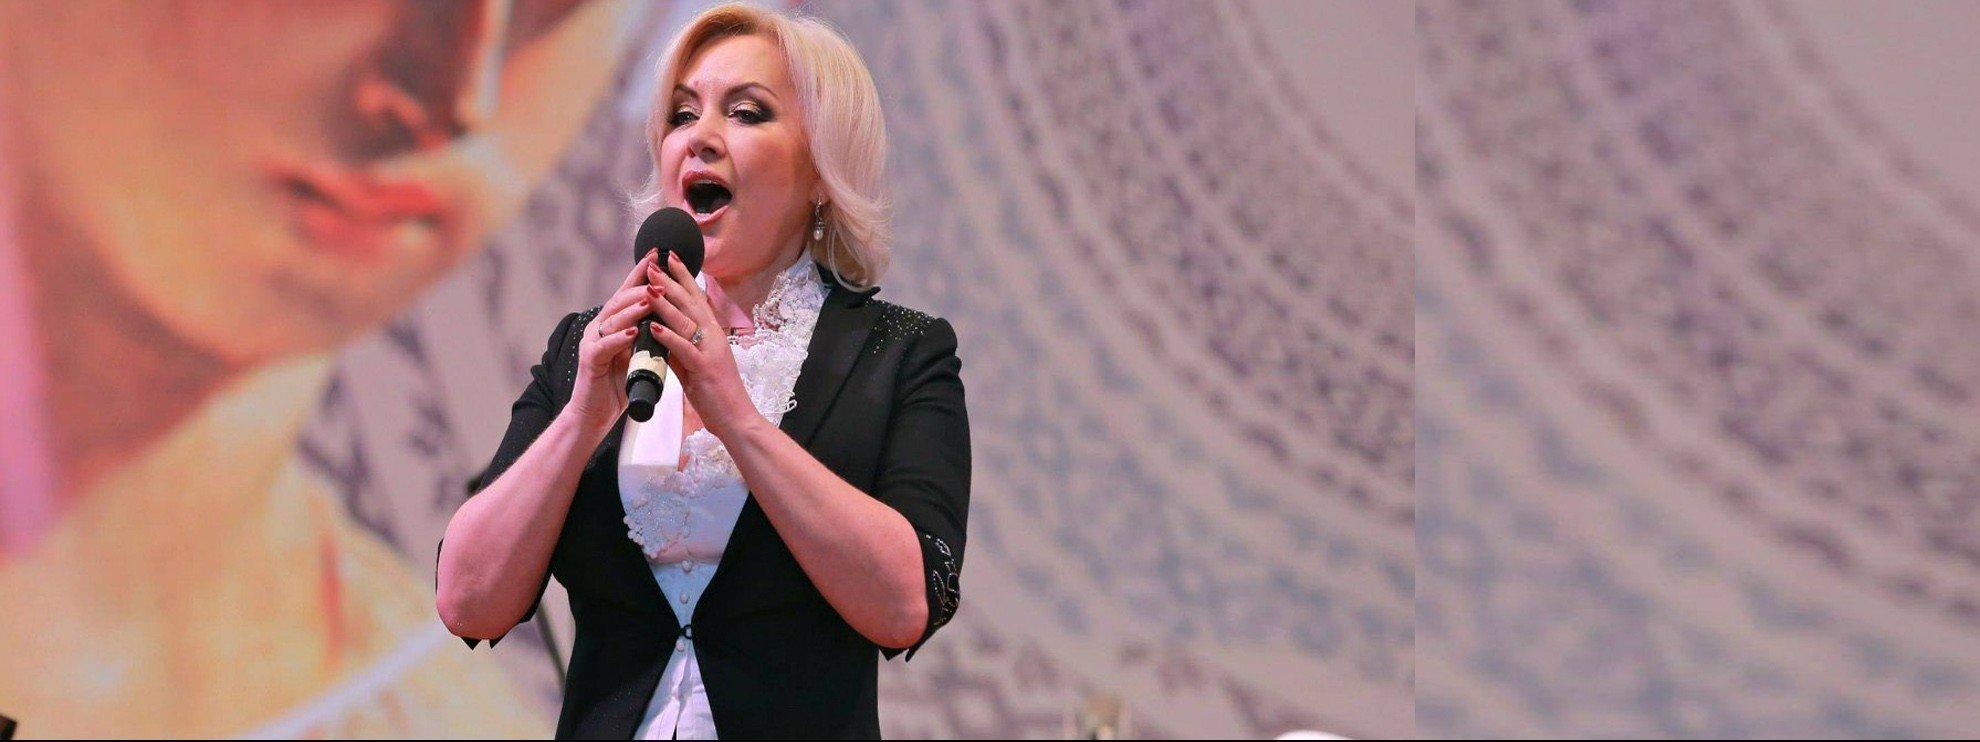 виконавець Оксана Билозир